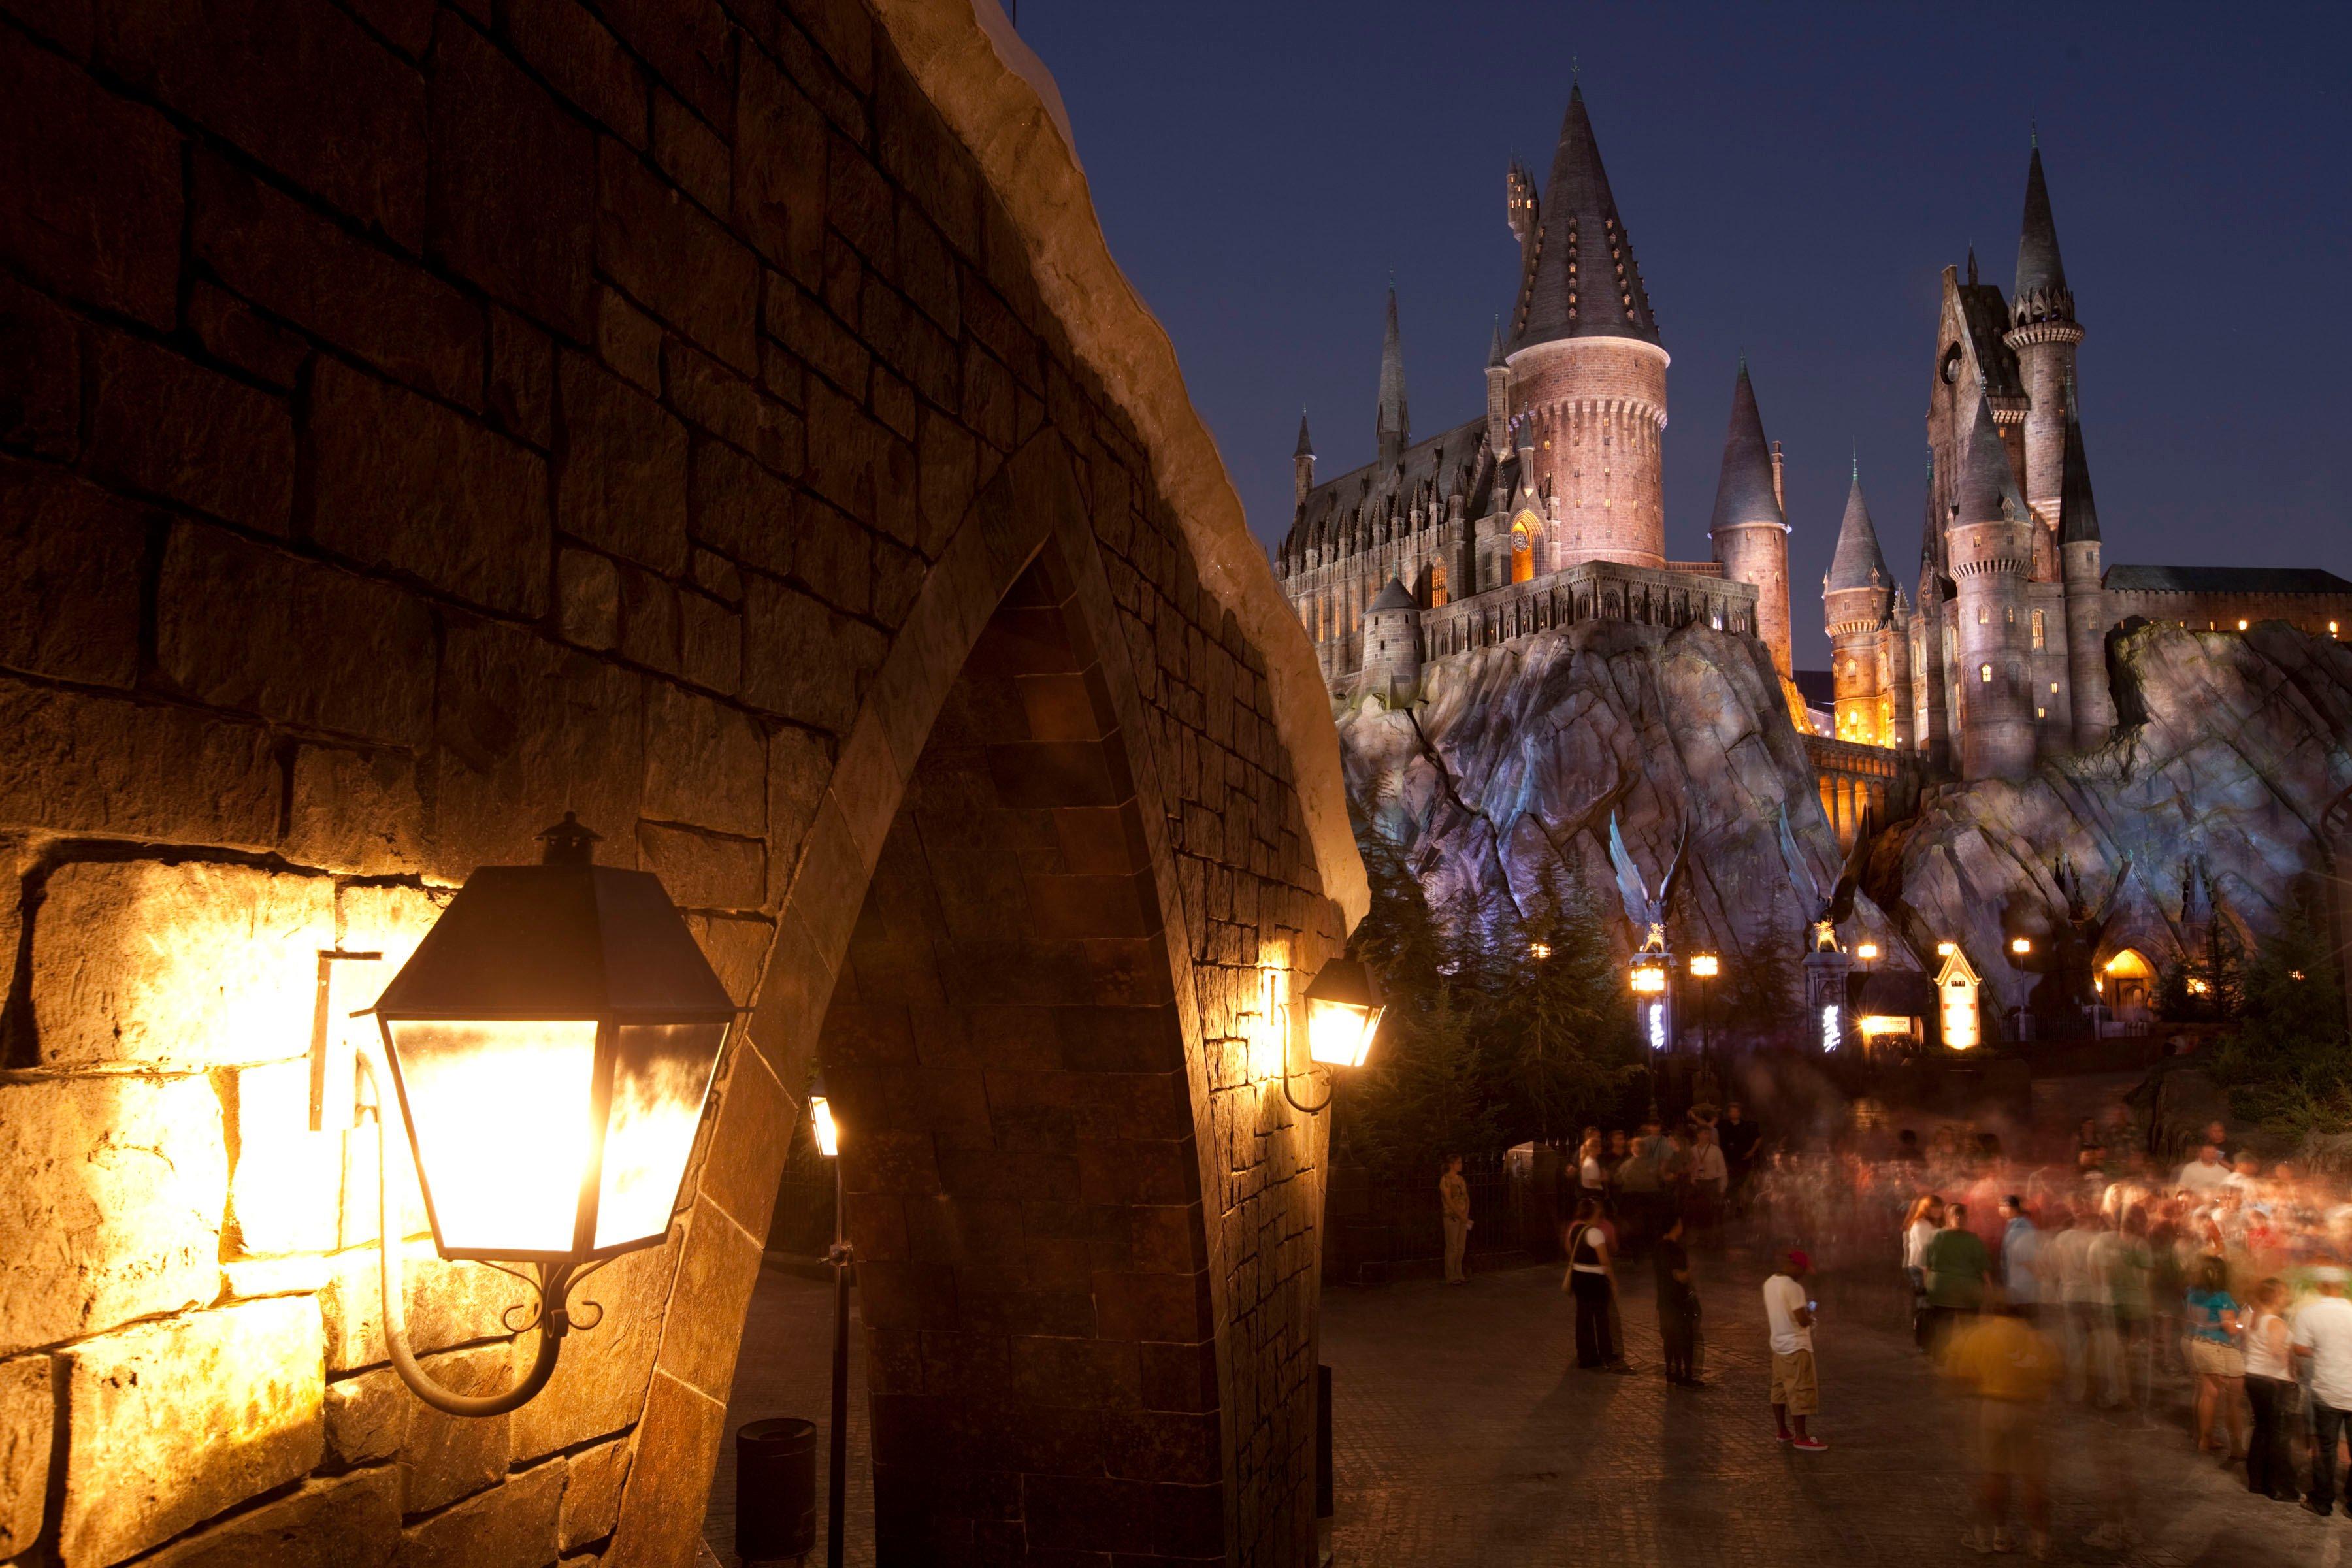 Harry Potter Christmas Wallpaper Hd.46 Hogwarts Wallpaper Hd On Wallpapersafari